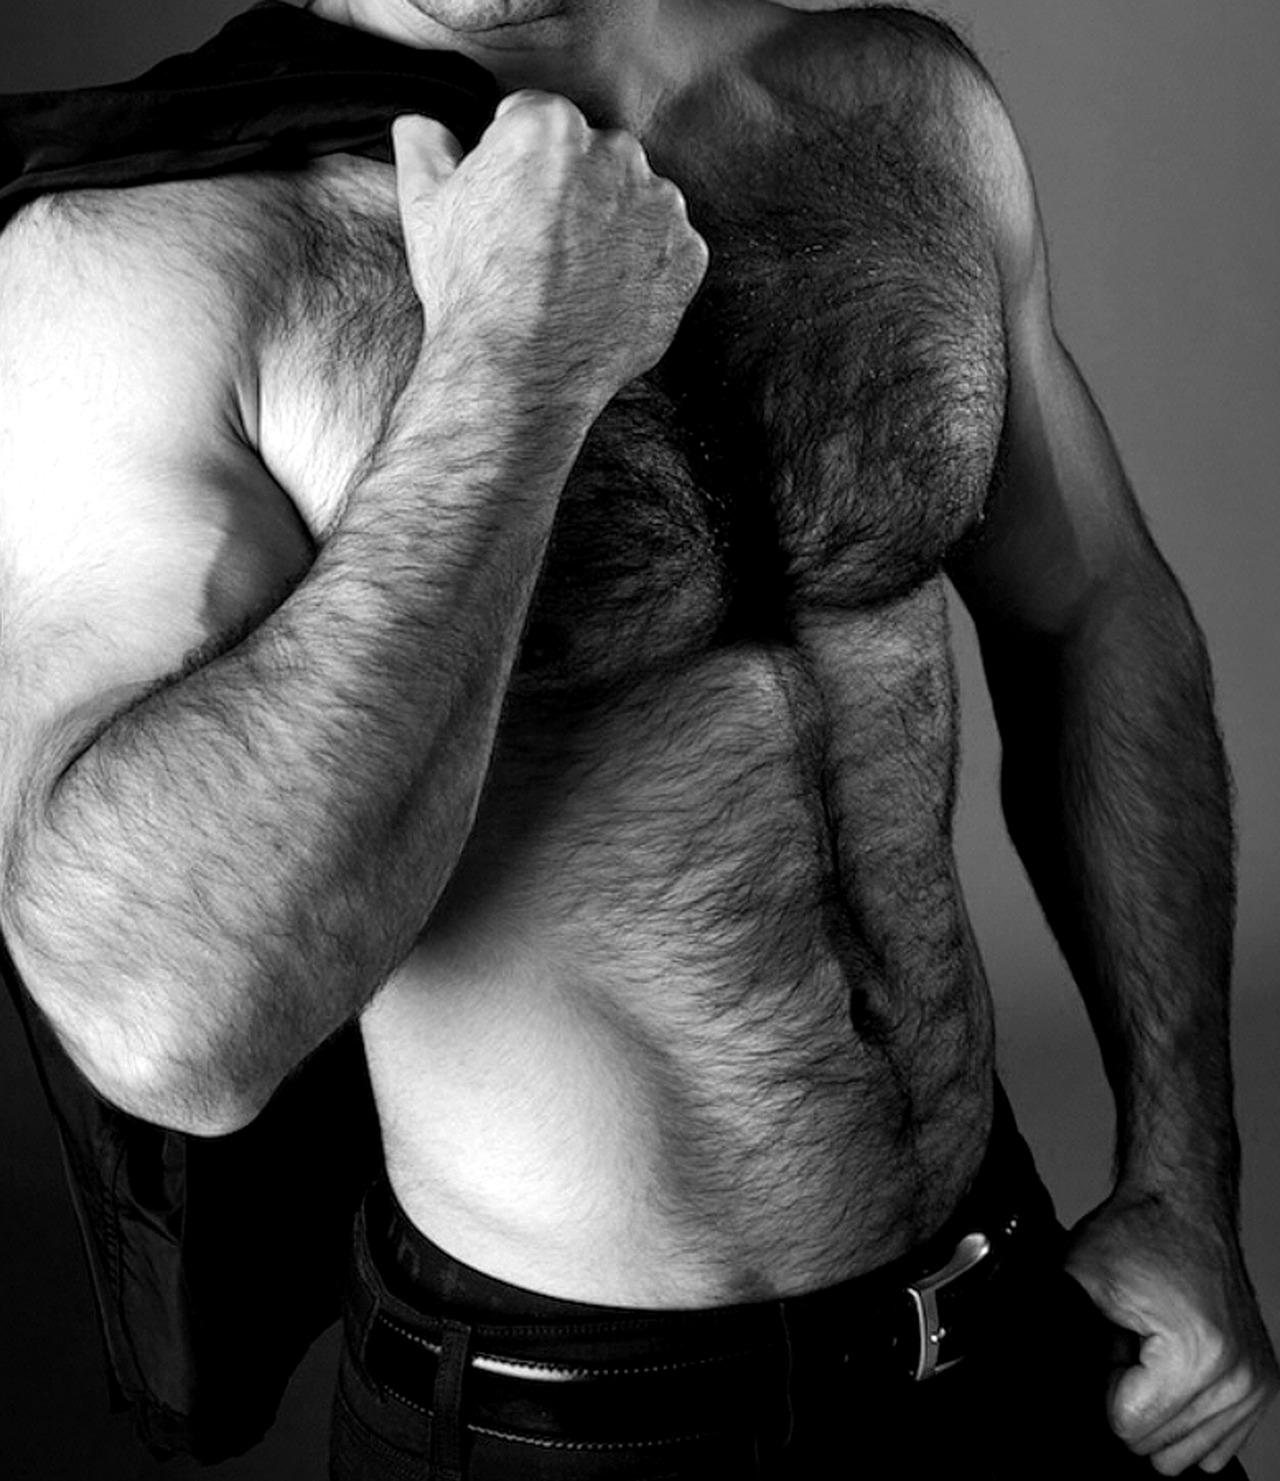 Фото секс тела мужик 26 фотография